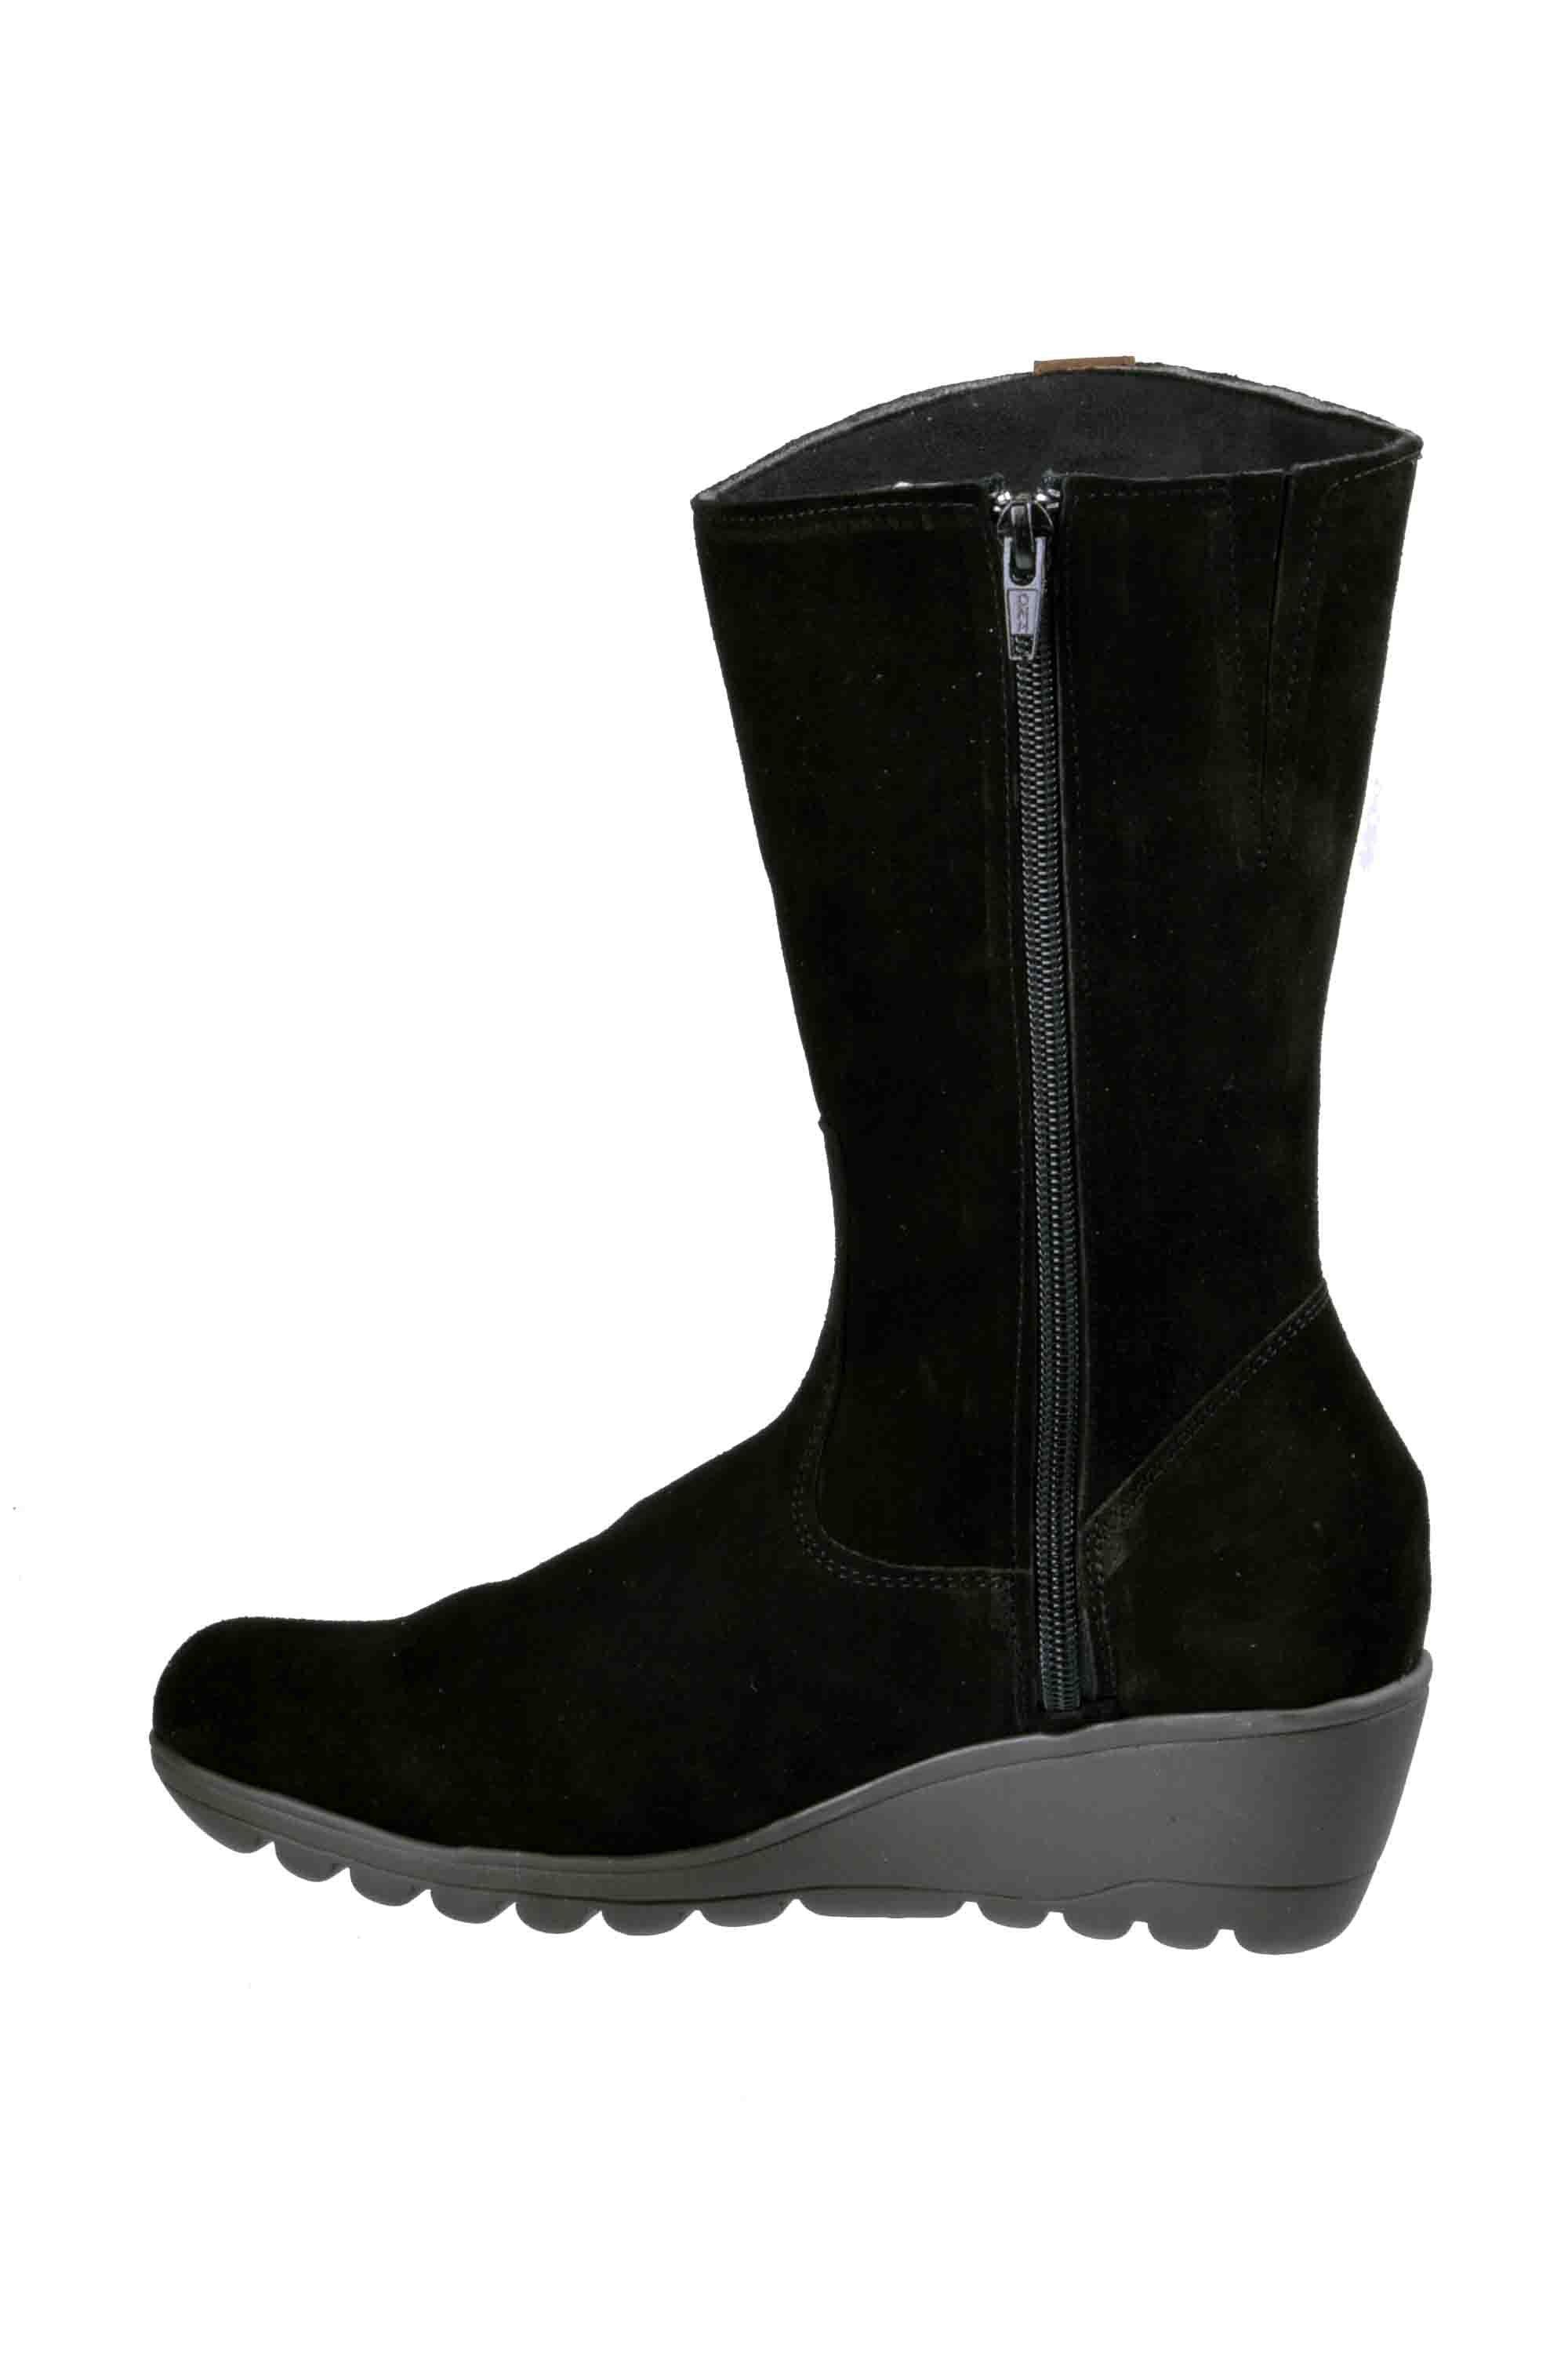 e428ef3f57d ... Γυναικεια Δερματινα Μποτακια Apostolidis Shoes City Boot Μαυρο ...